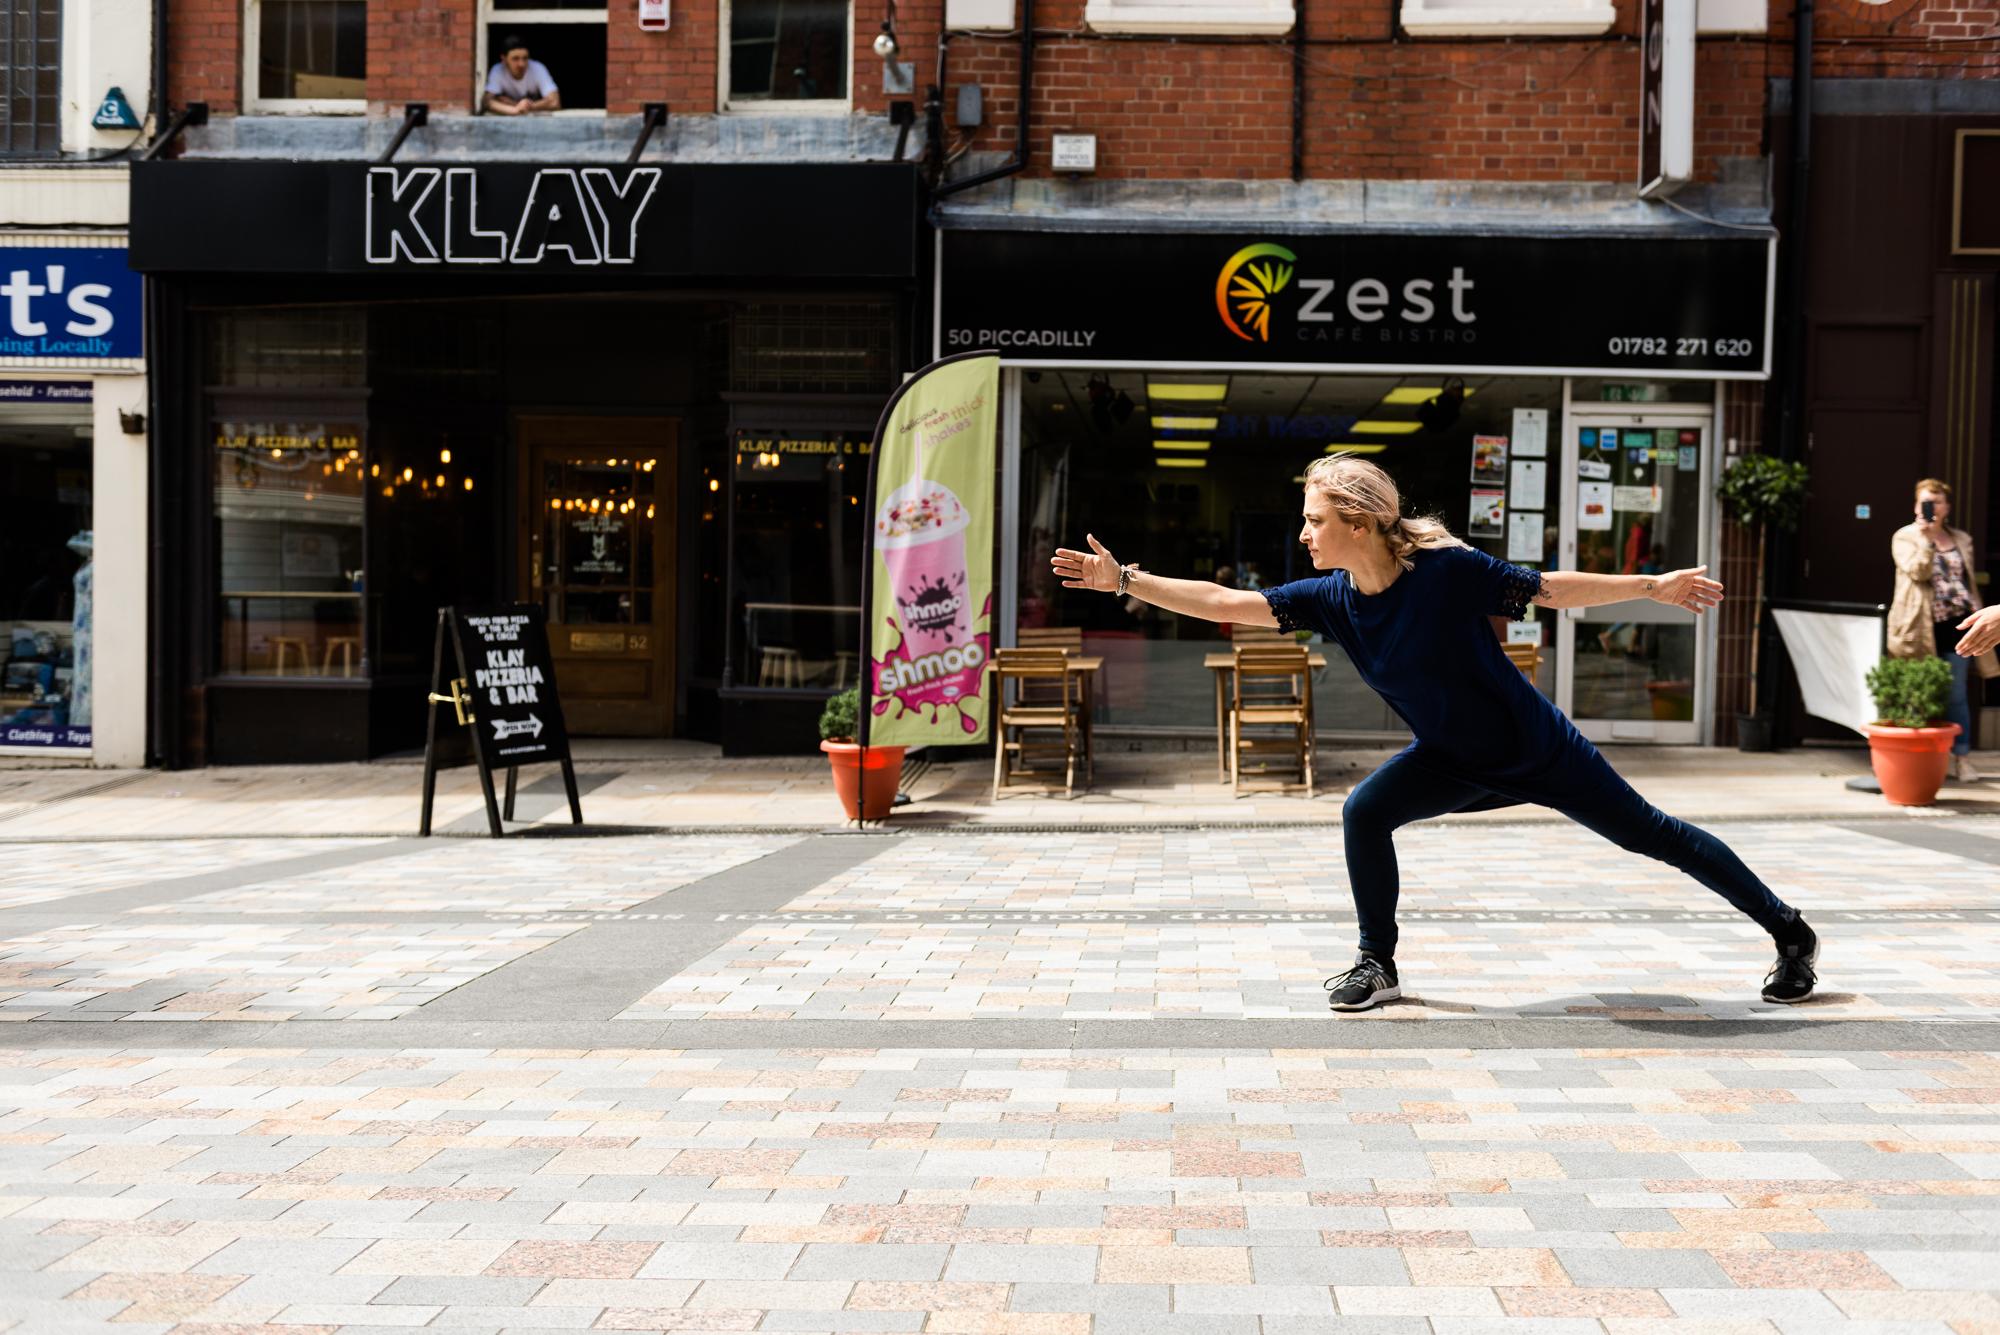 Documentary Photographs Dance Photography - Restoke - Big Dance - Dancing in the Street -  Picadilly, Hanley - Jenny Harper-6.jpg